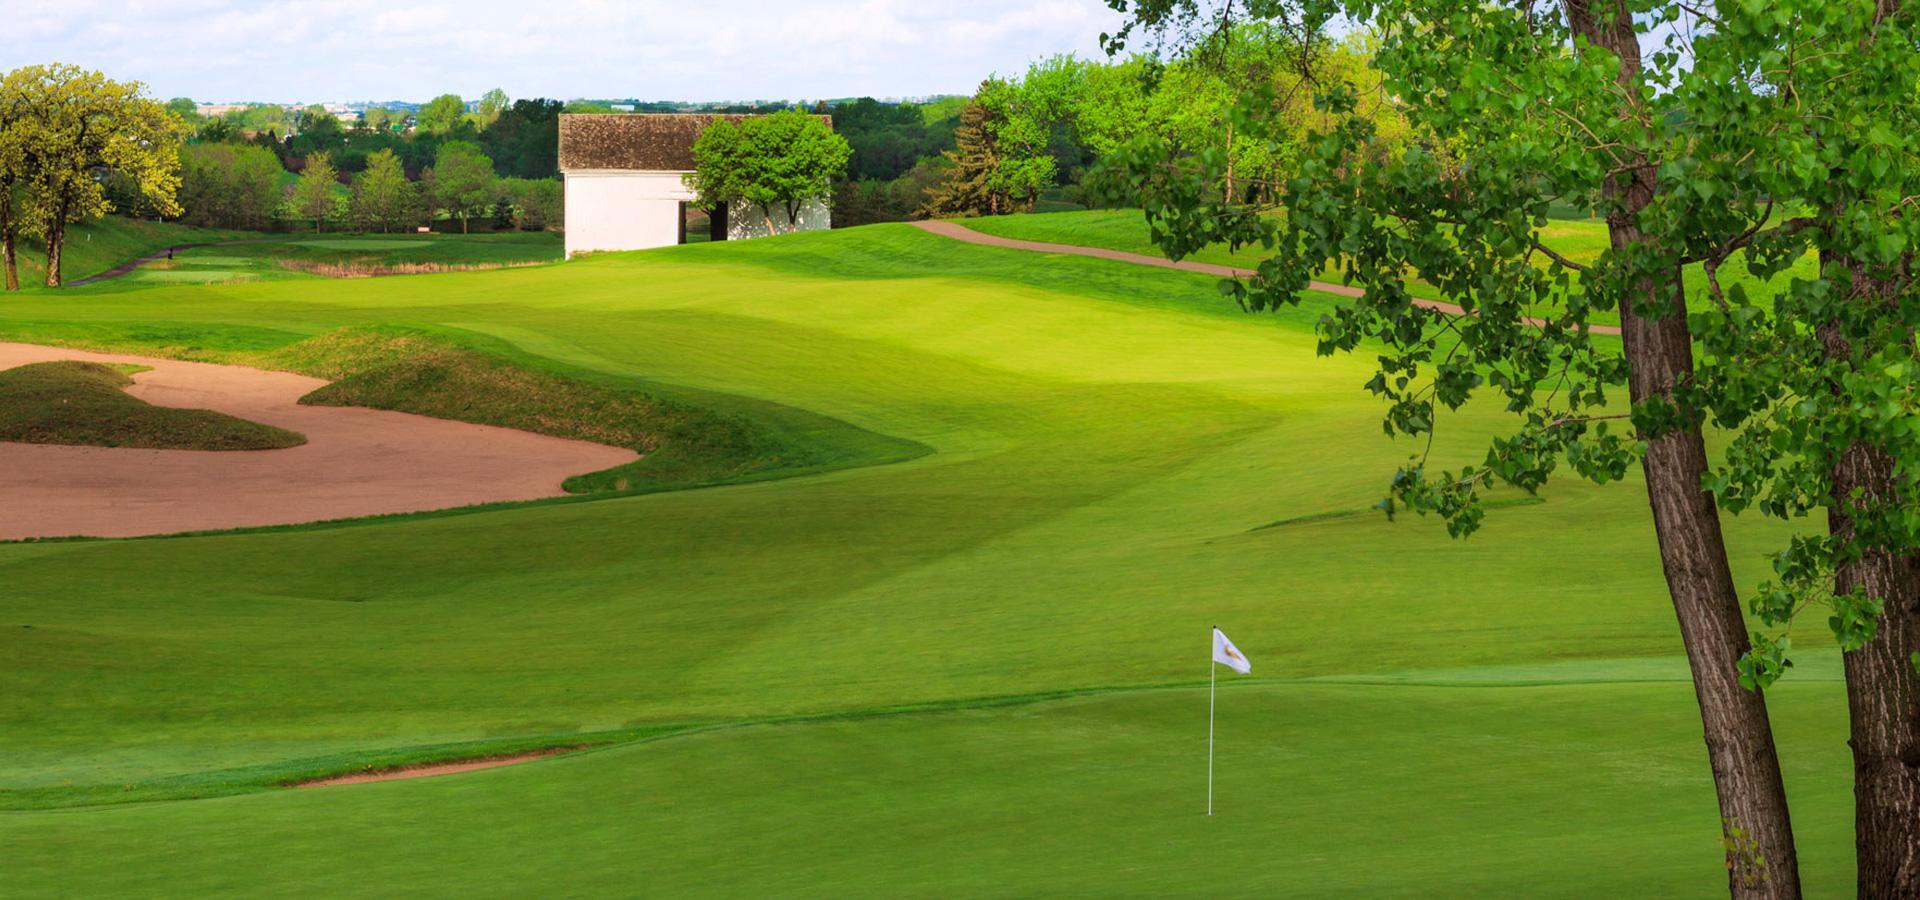 Golf Course In Twin Cities Mn Public Golf Course Near Stillwater Minneapolis St Paul Twin Cities Mn Stone Ridge Golf Club